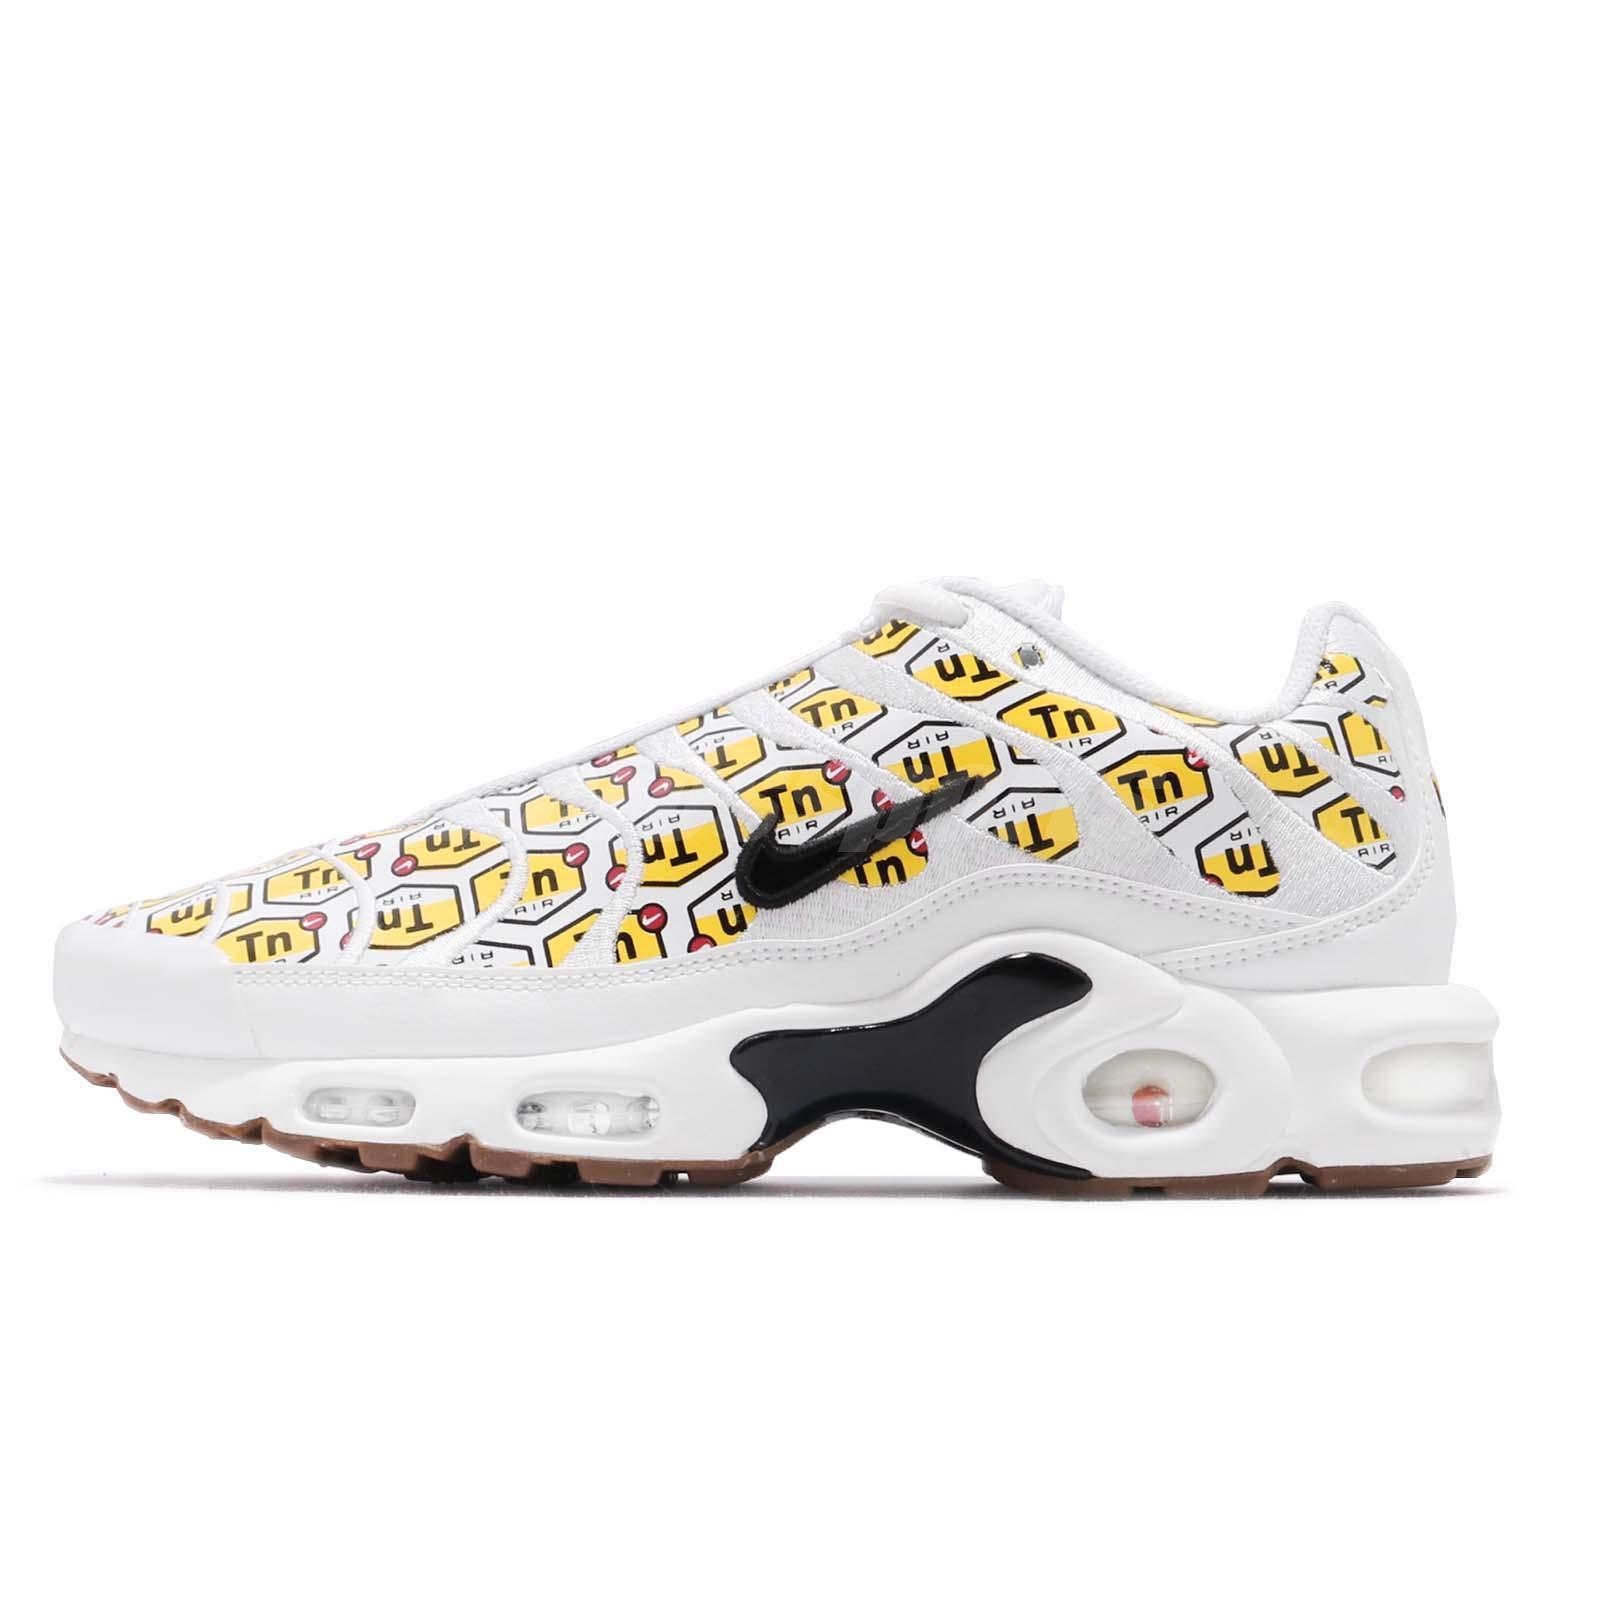 Nike Air Max Plus QS All Over Print White Black Yellow Gum Men Shoes  903827-100 a85c9bff3